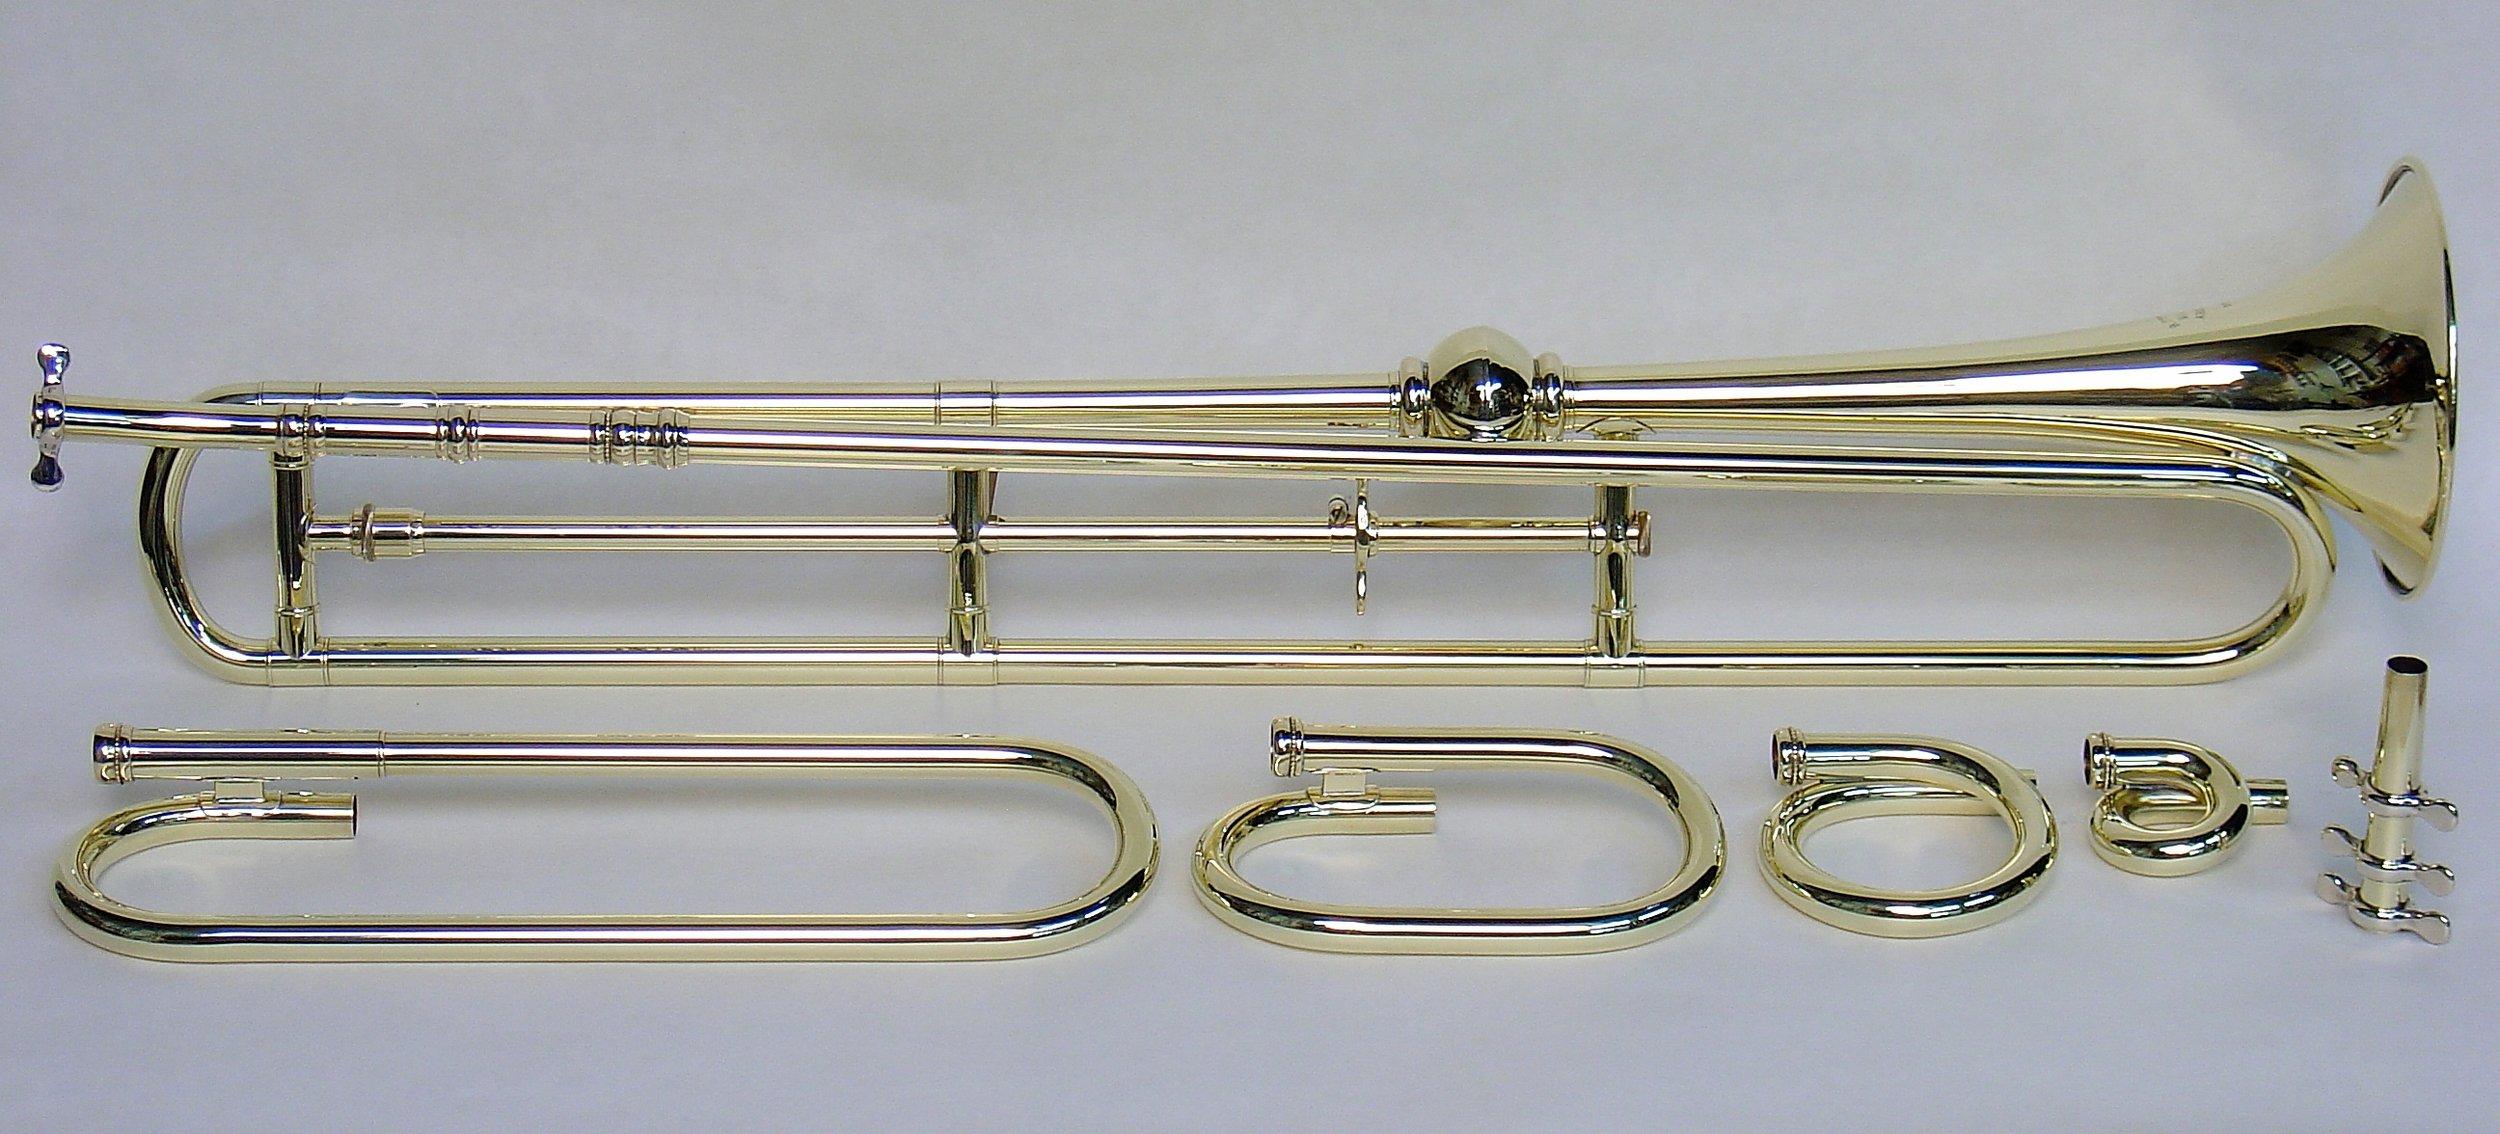 English Slide Trumpet Replica